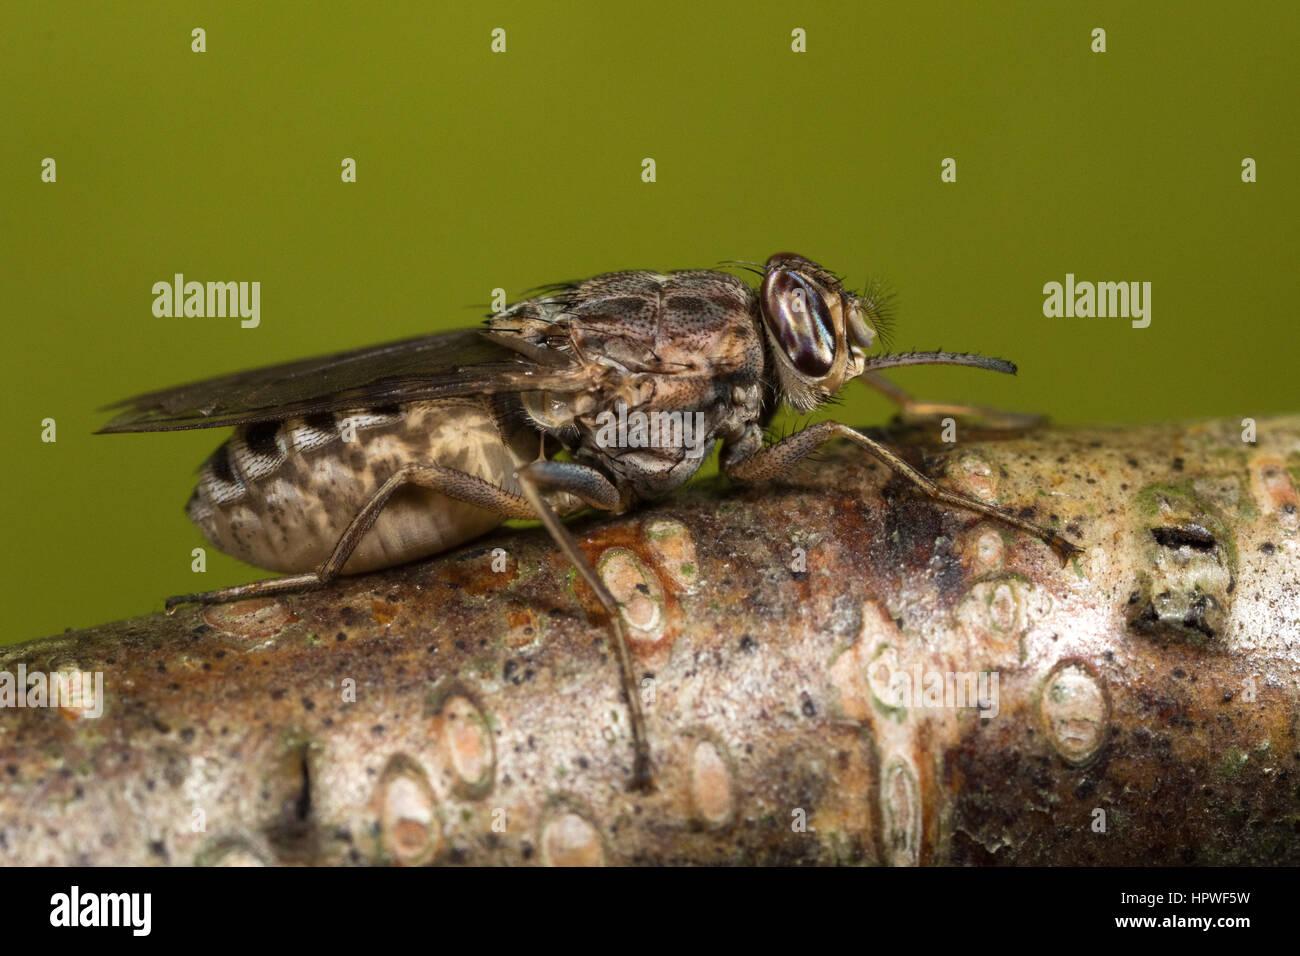 Les femmes enceintes de glossines Savannah (Glossina morsitans) Photo Stock